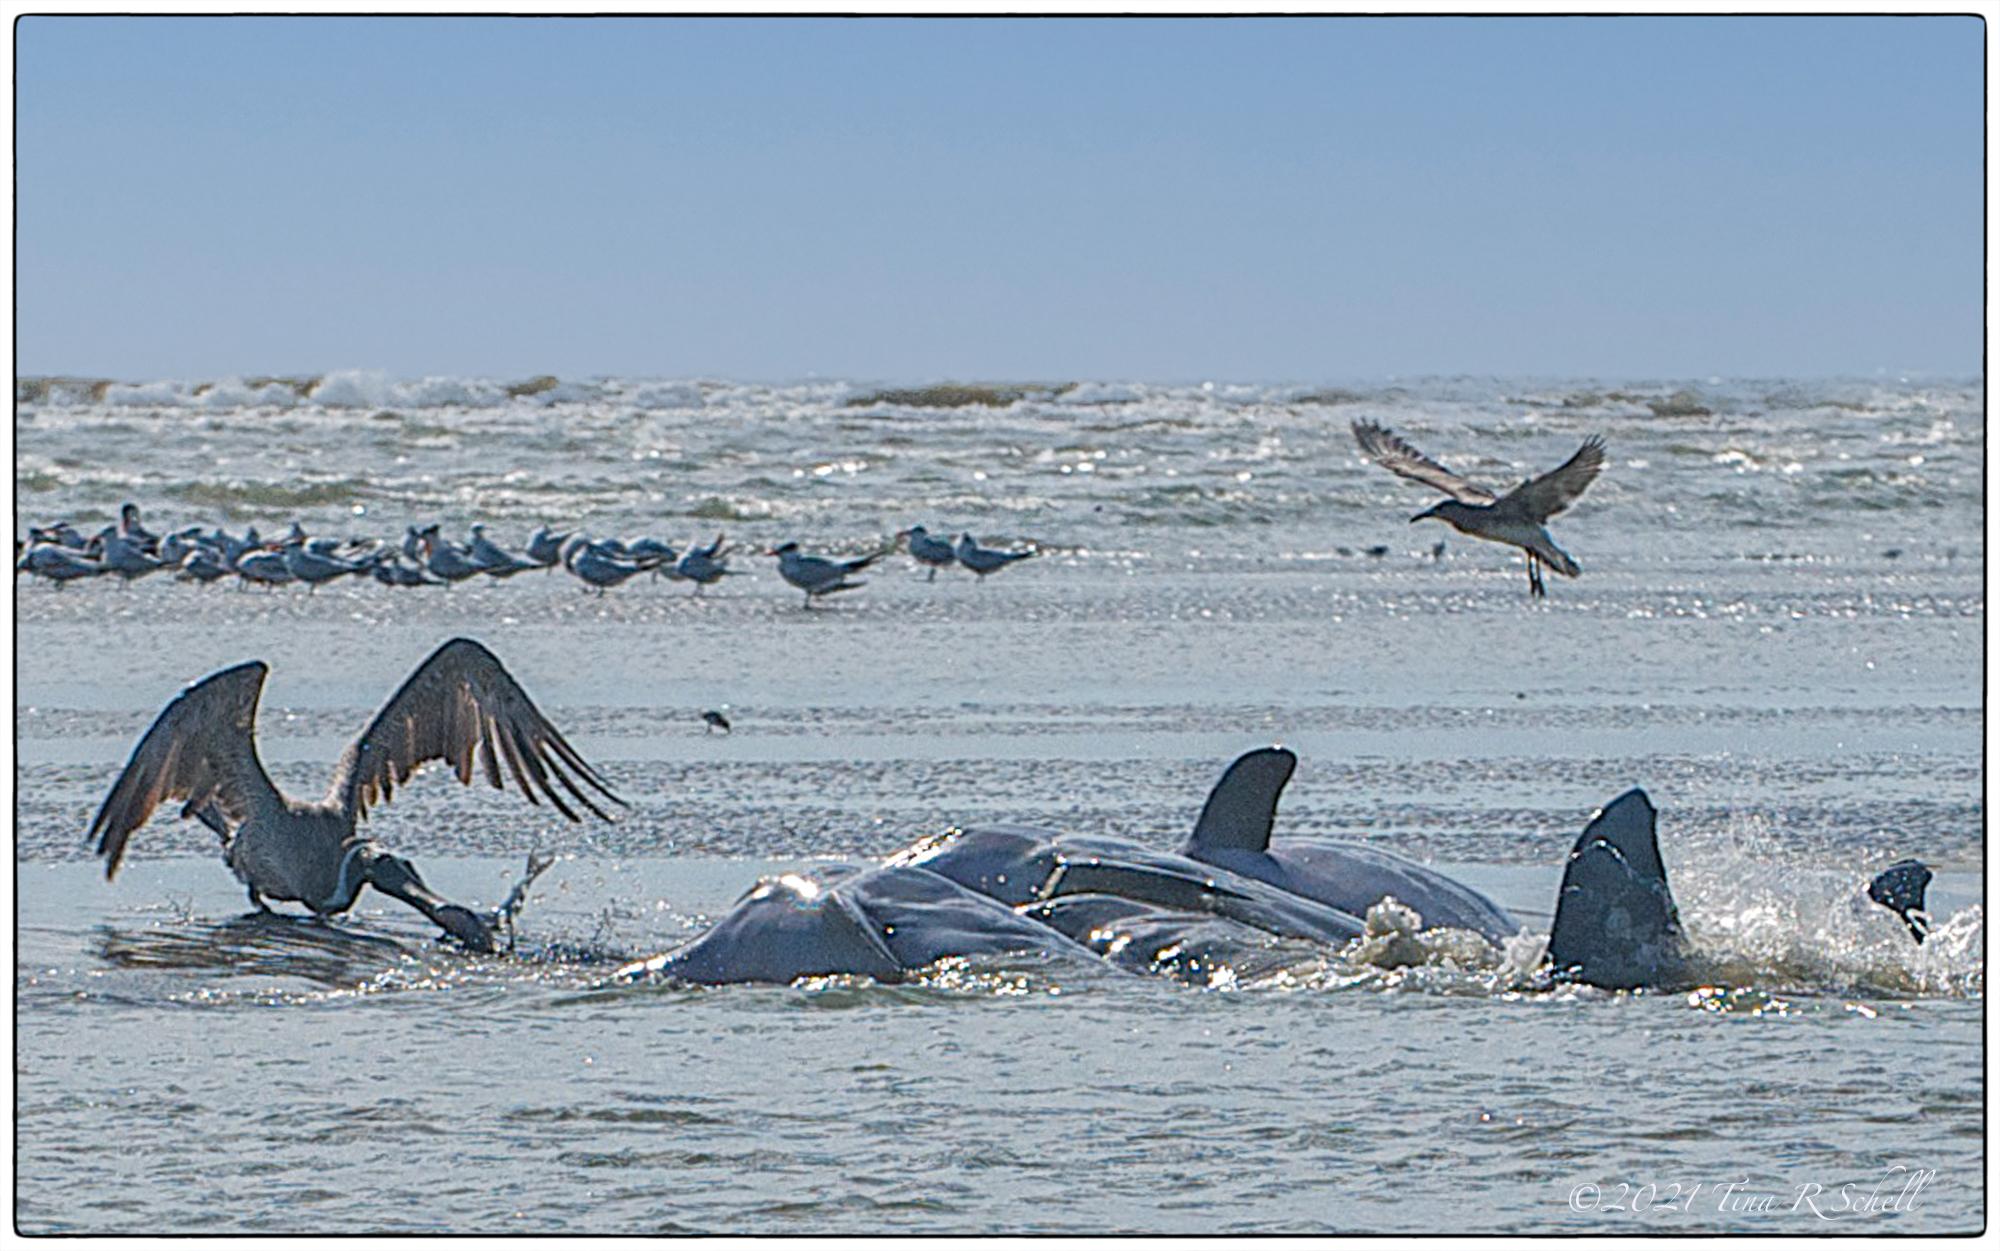 dolphins, pelican, strand feeding, ocean